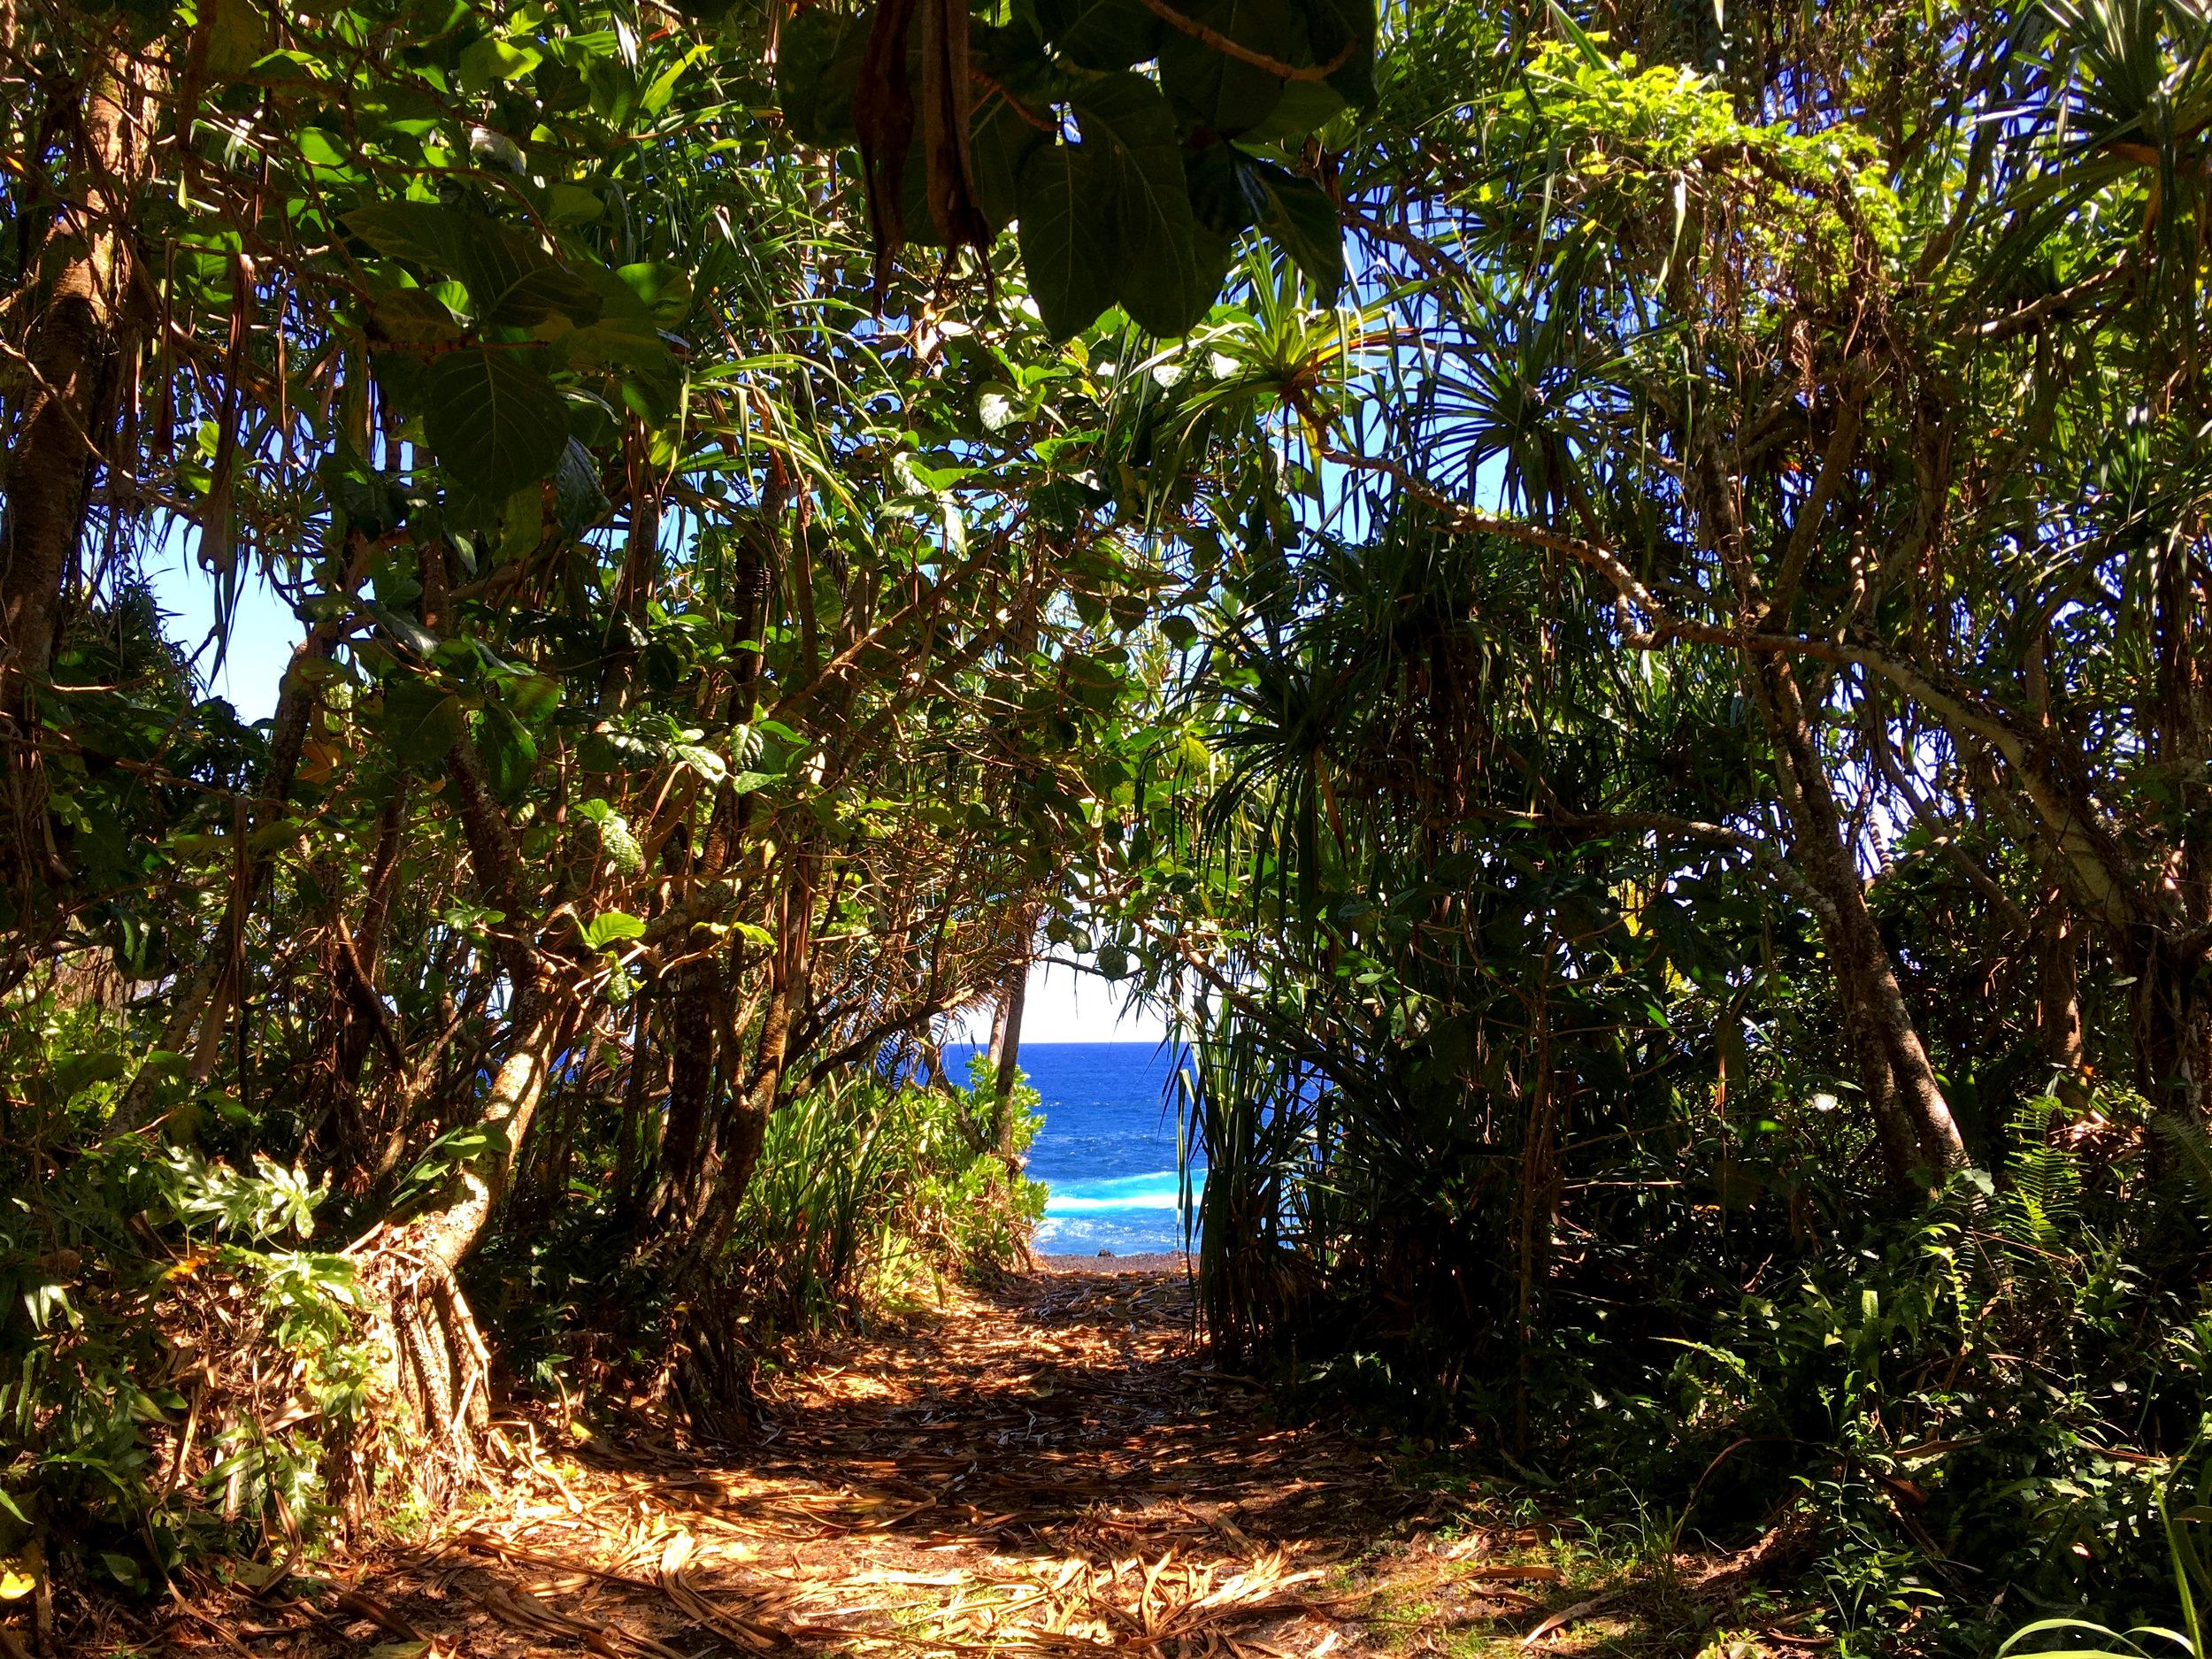 GATEWAY TO THE OCEAN, HAWAII